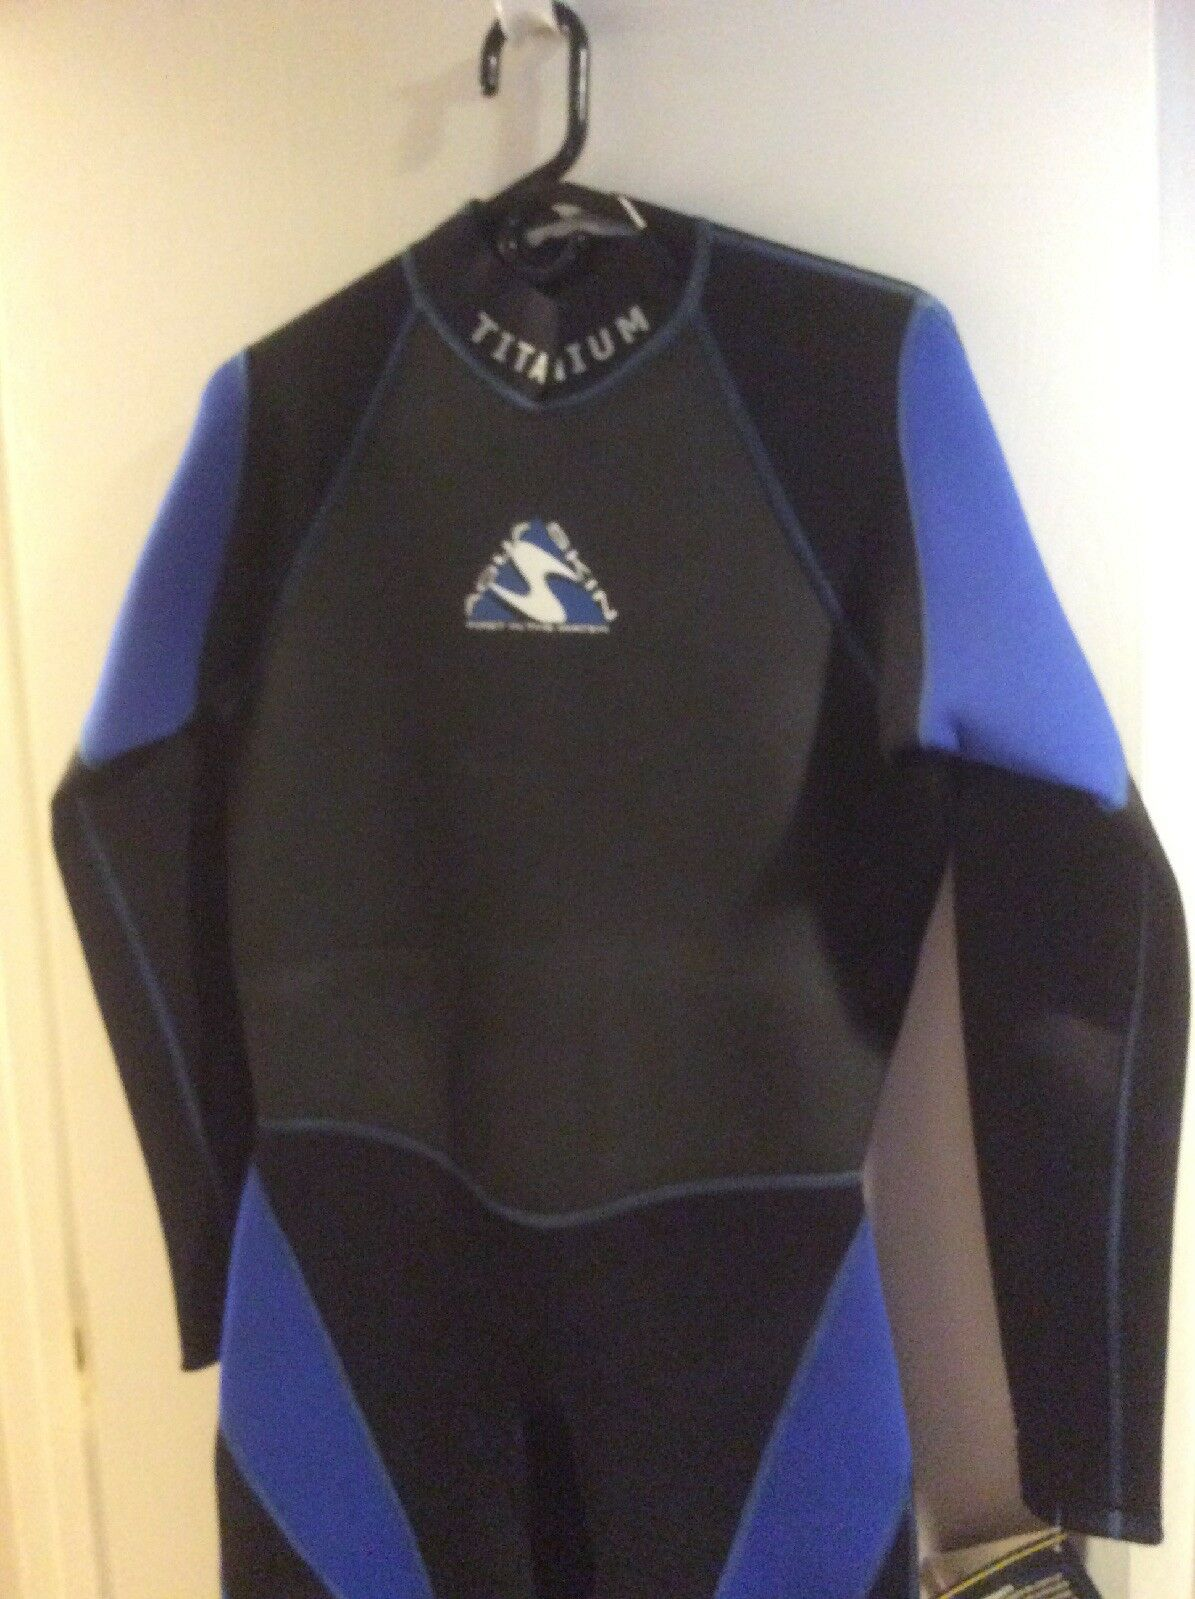 US Divers Aquaskin Full Wetsuit Xlarge, Make An Offer